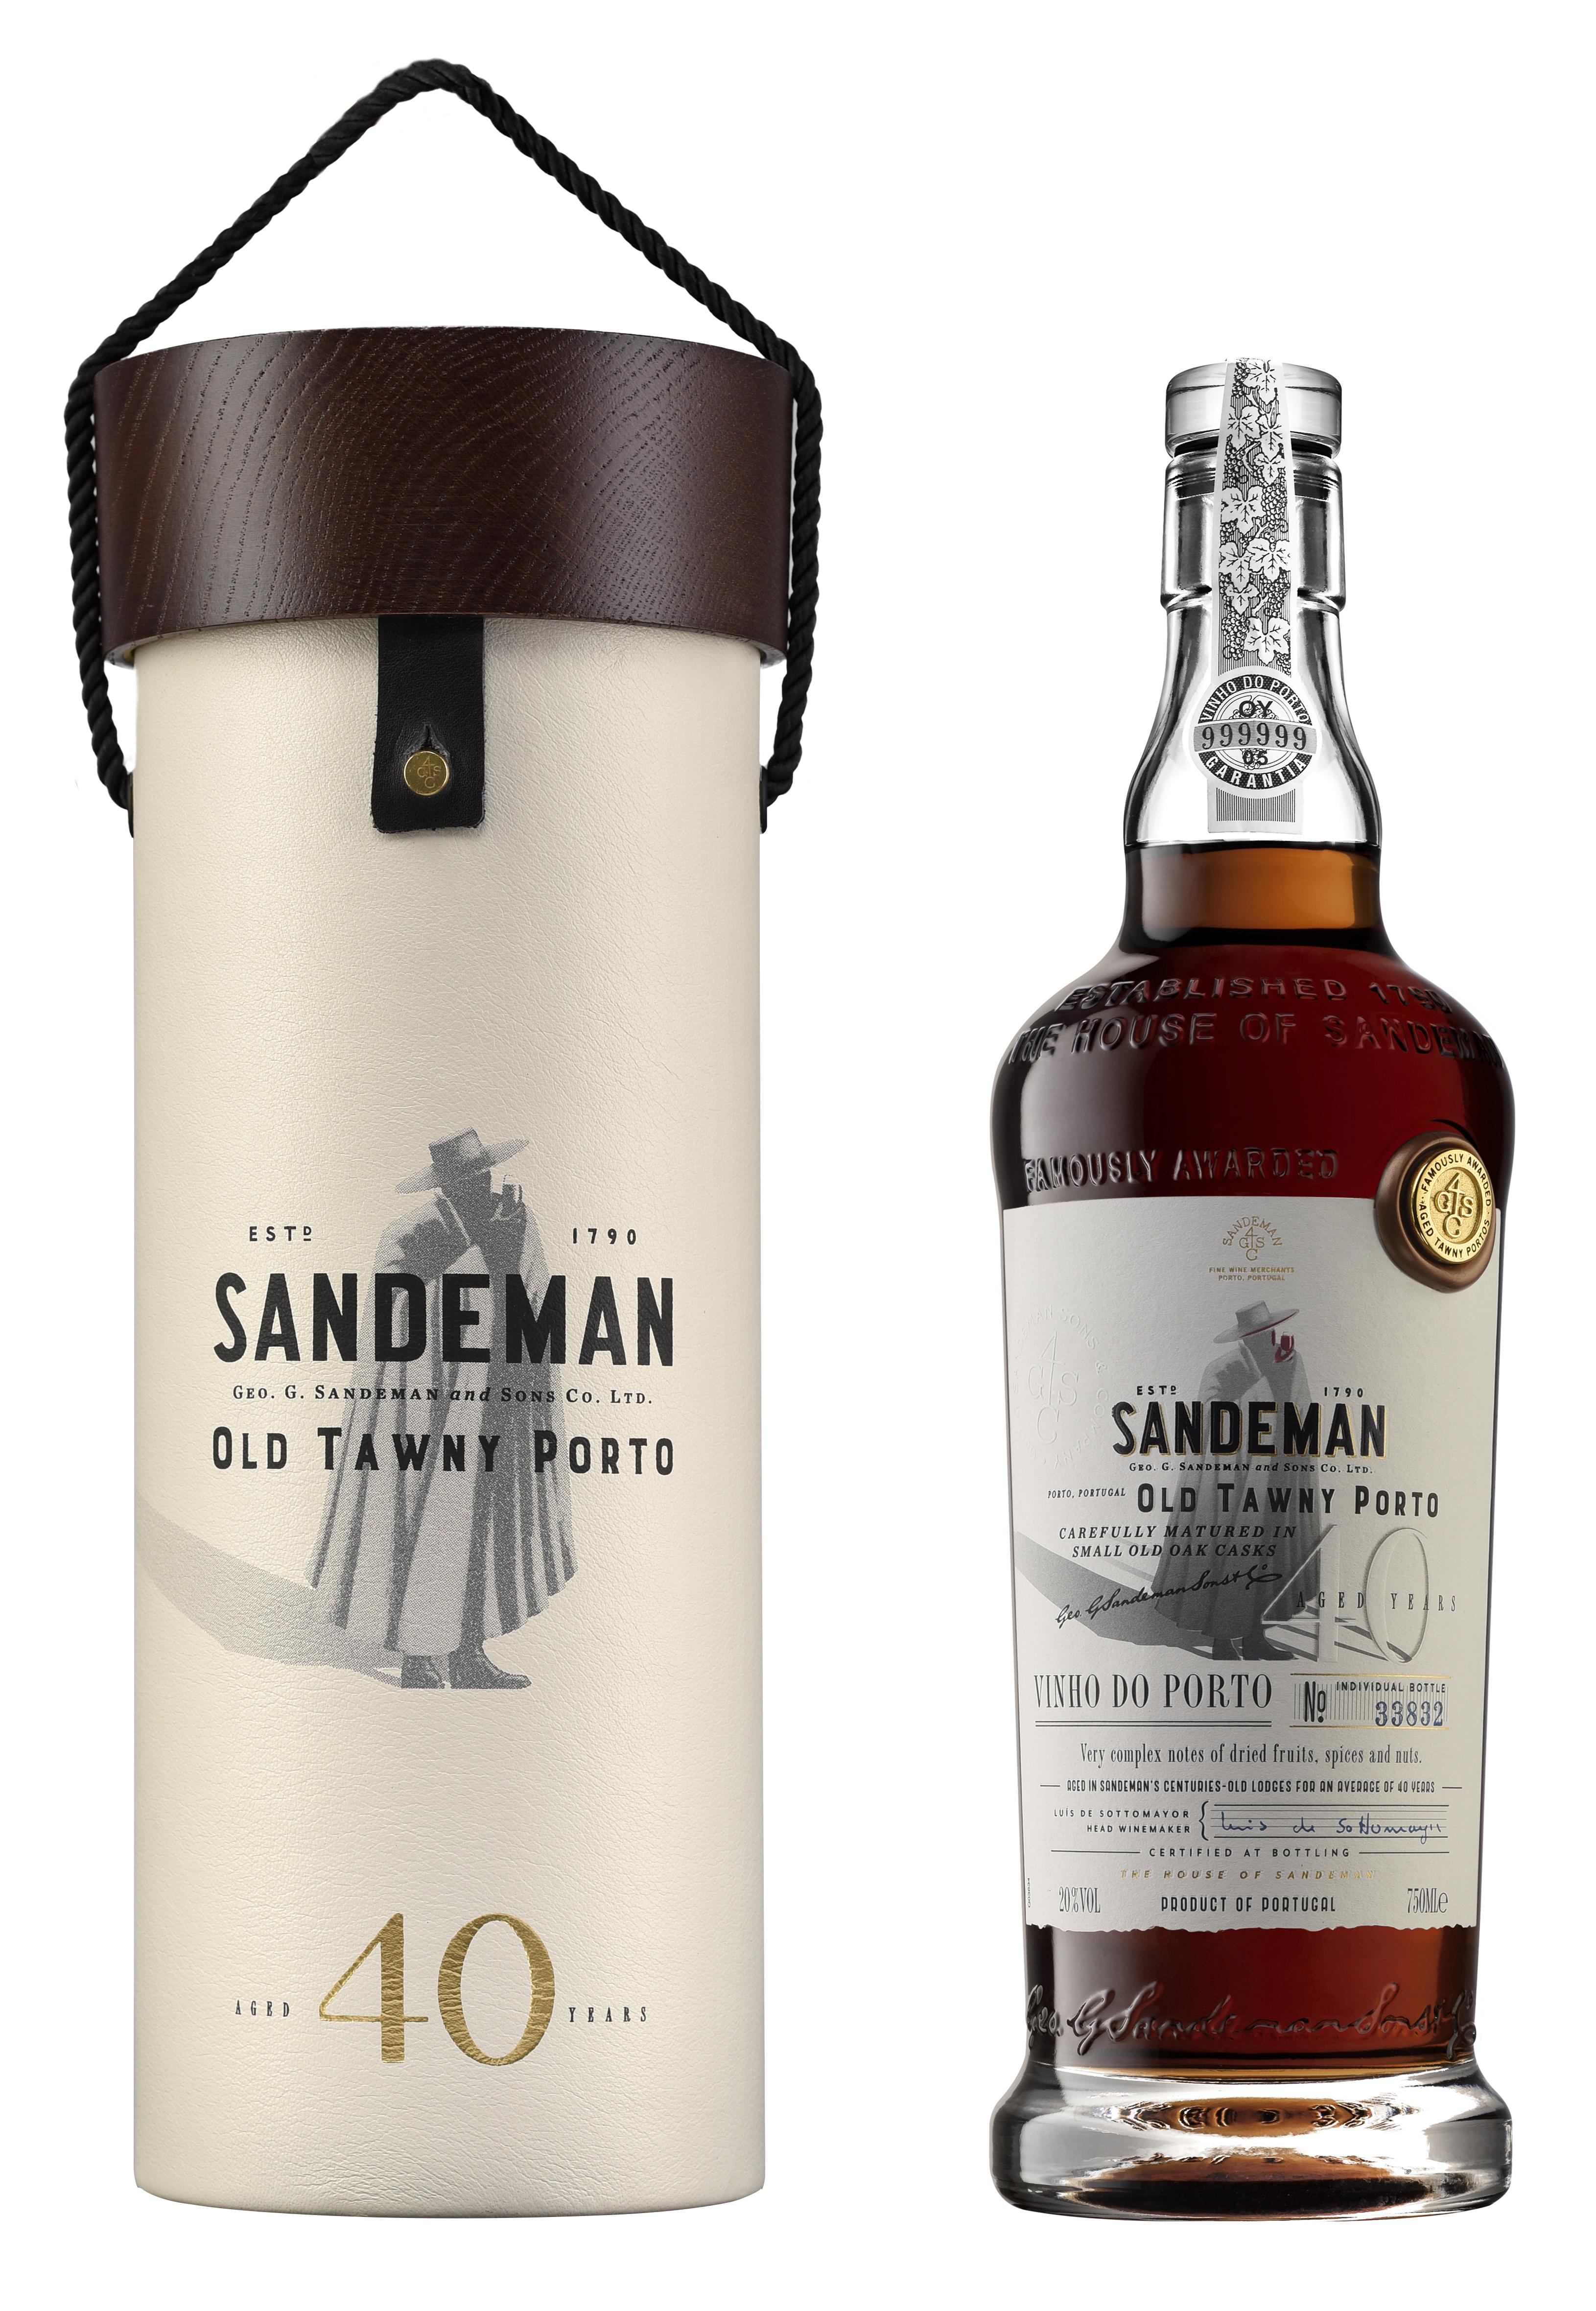 Sandeman Port, 40 Year Old Tawny Port Wooden Box NV